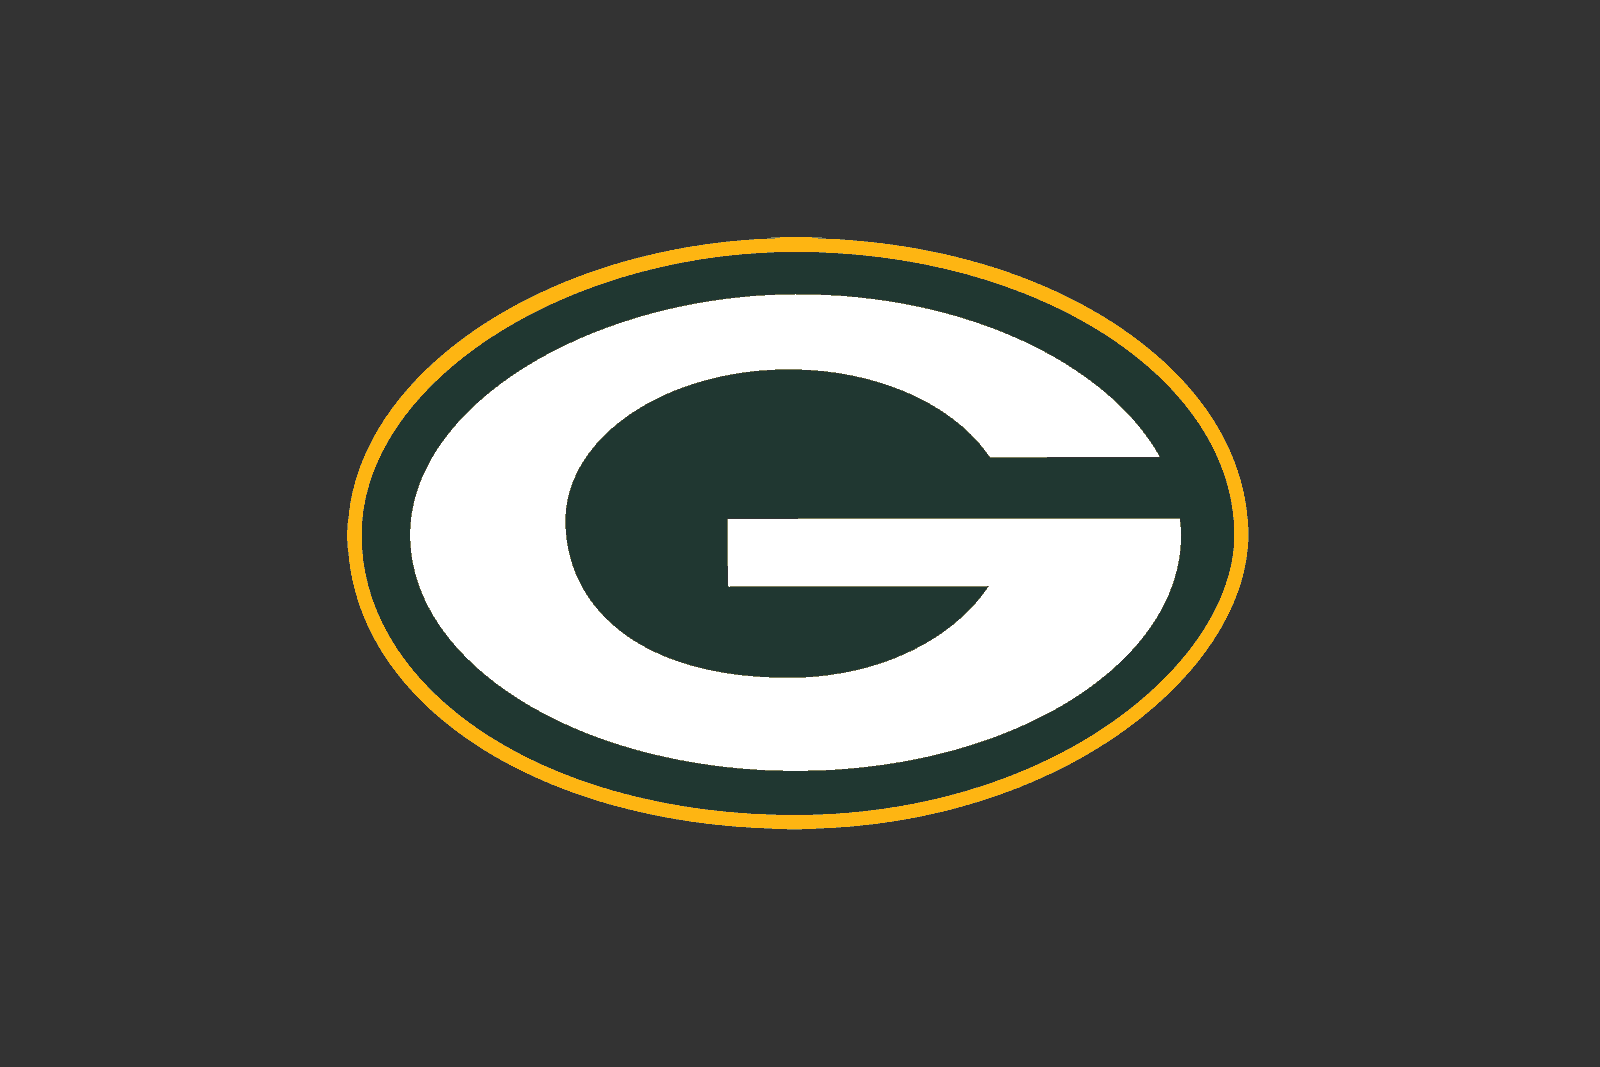 2019 Green Bay Packers Schedule